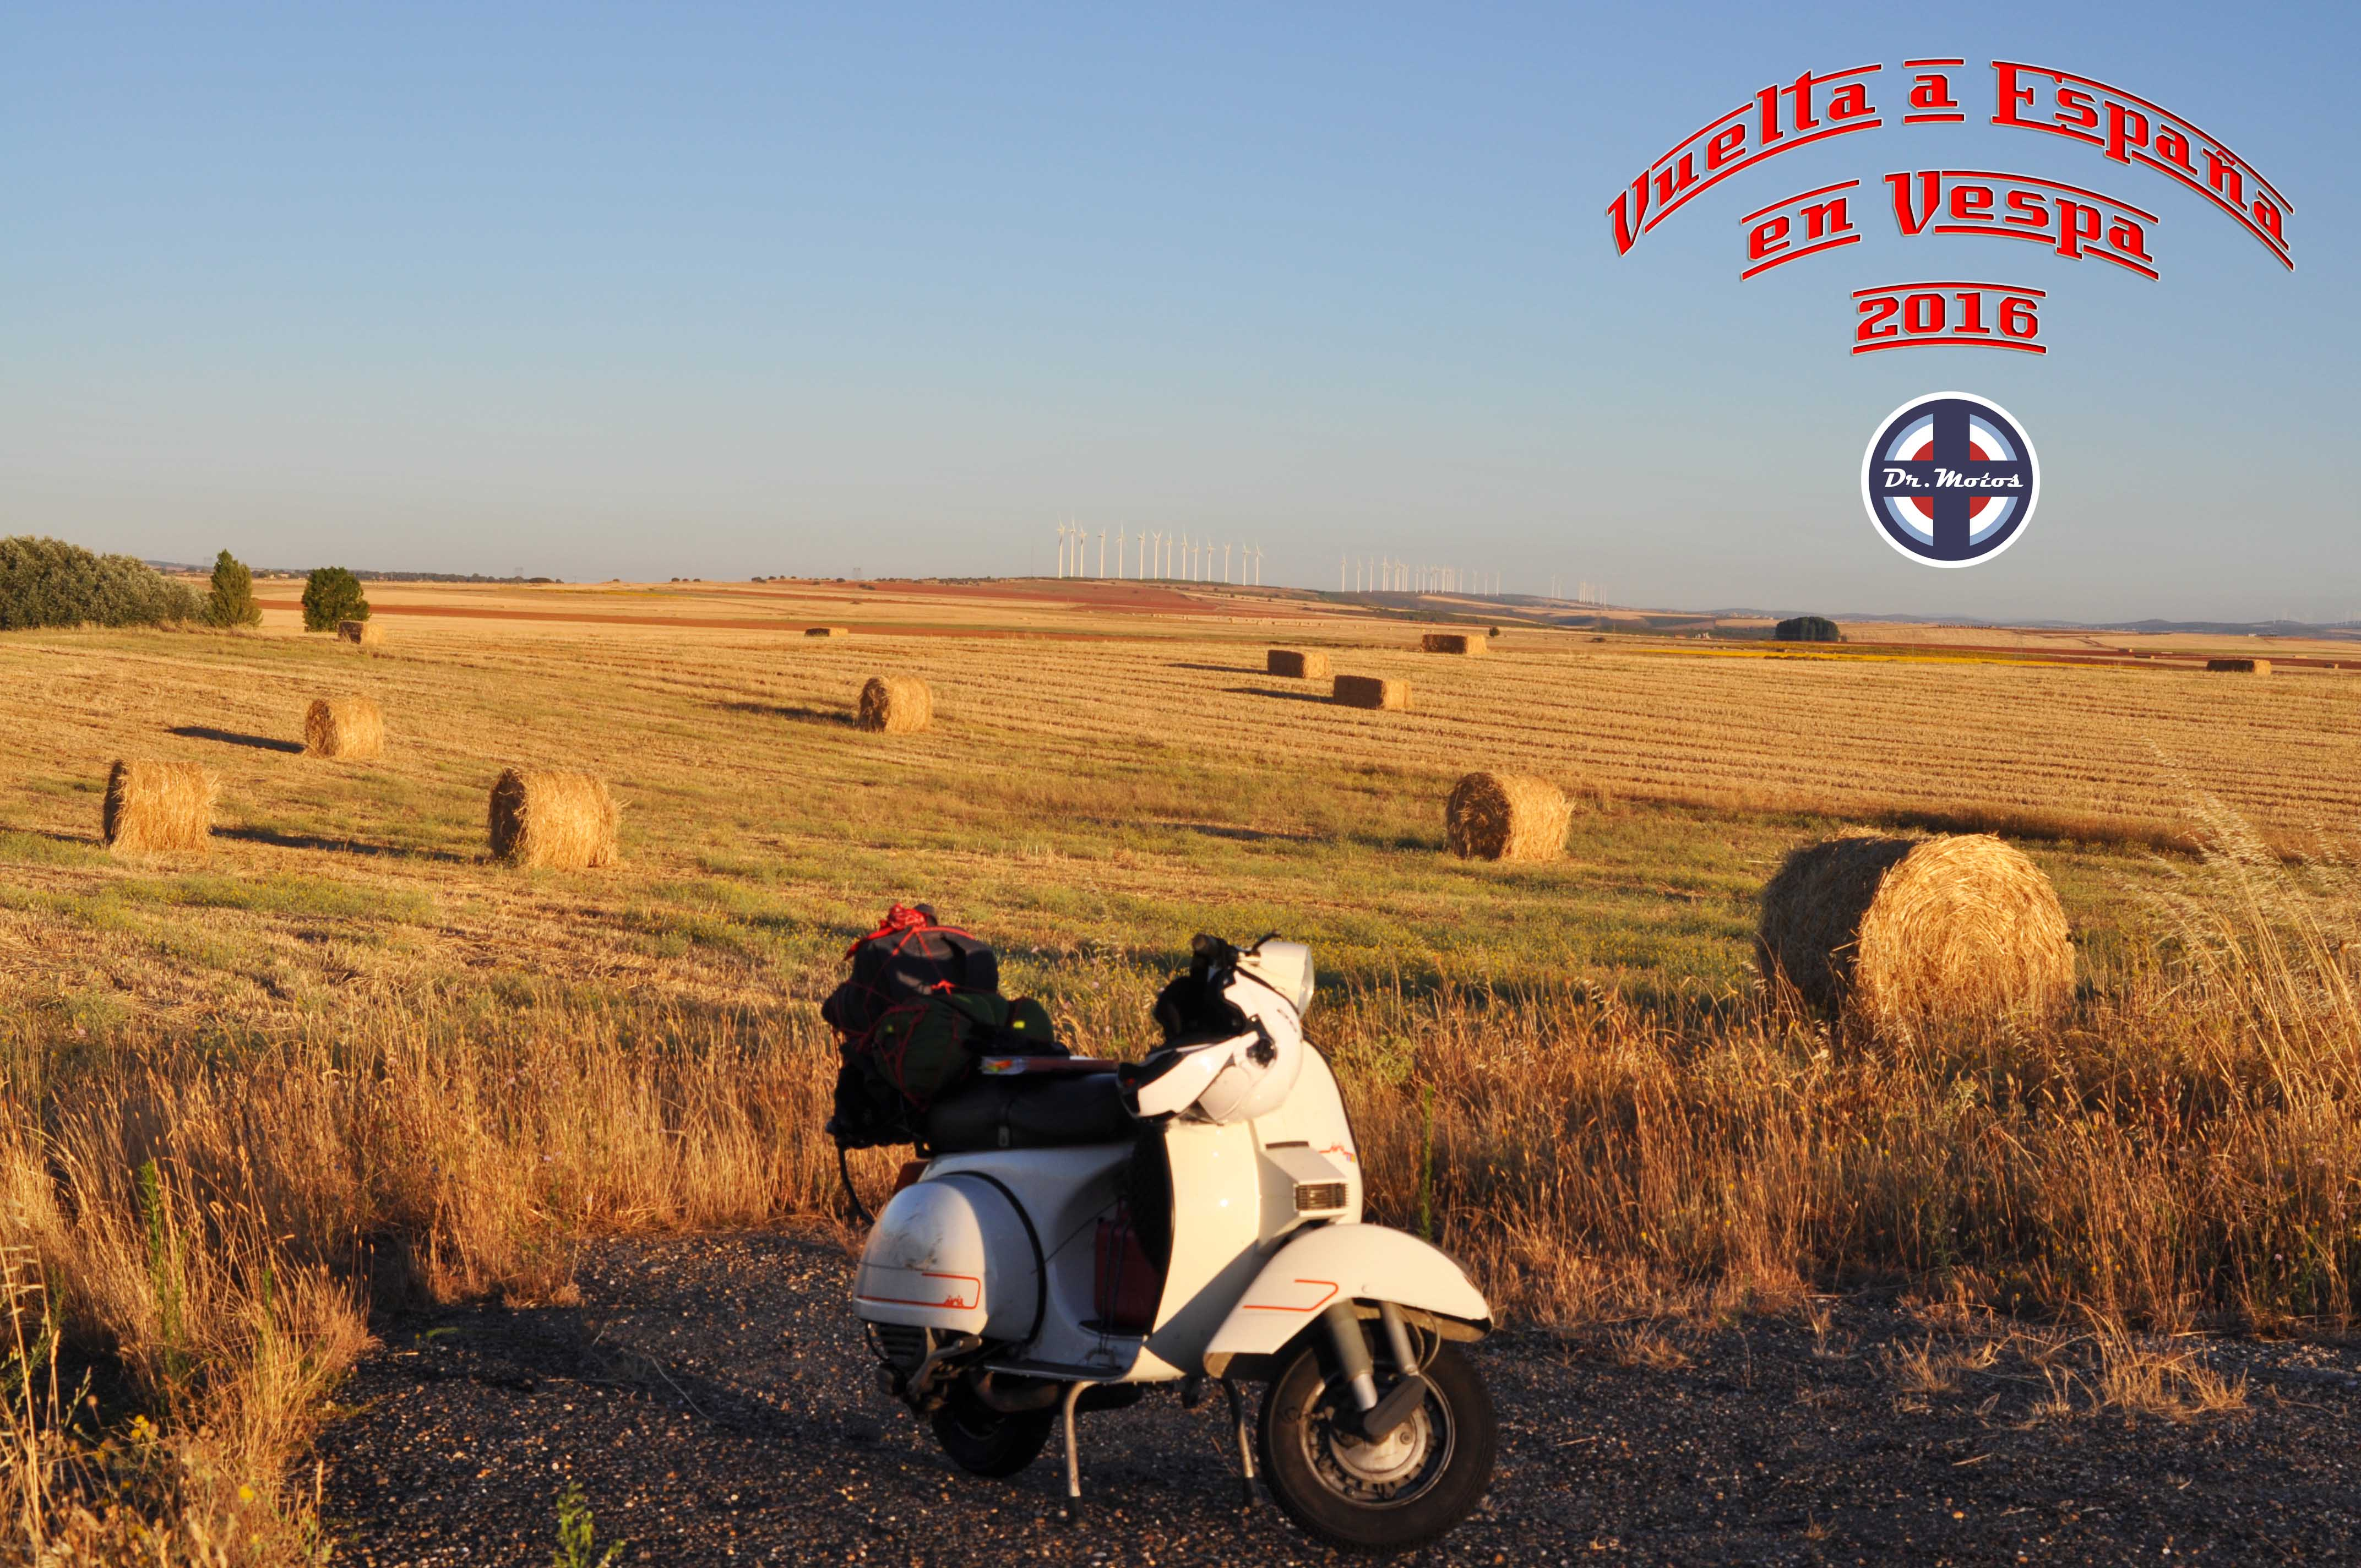 vuelta-espana-2106-logo